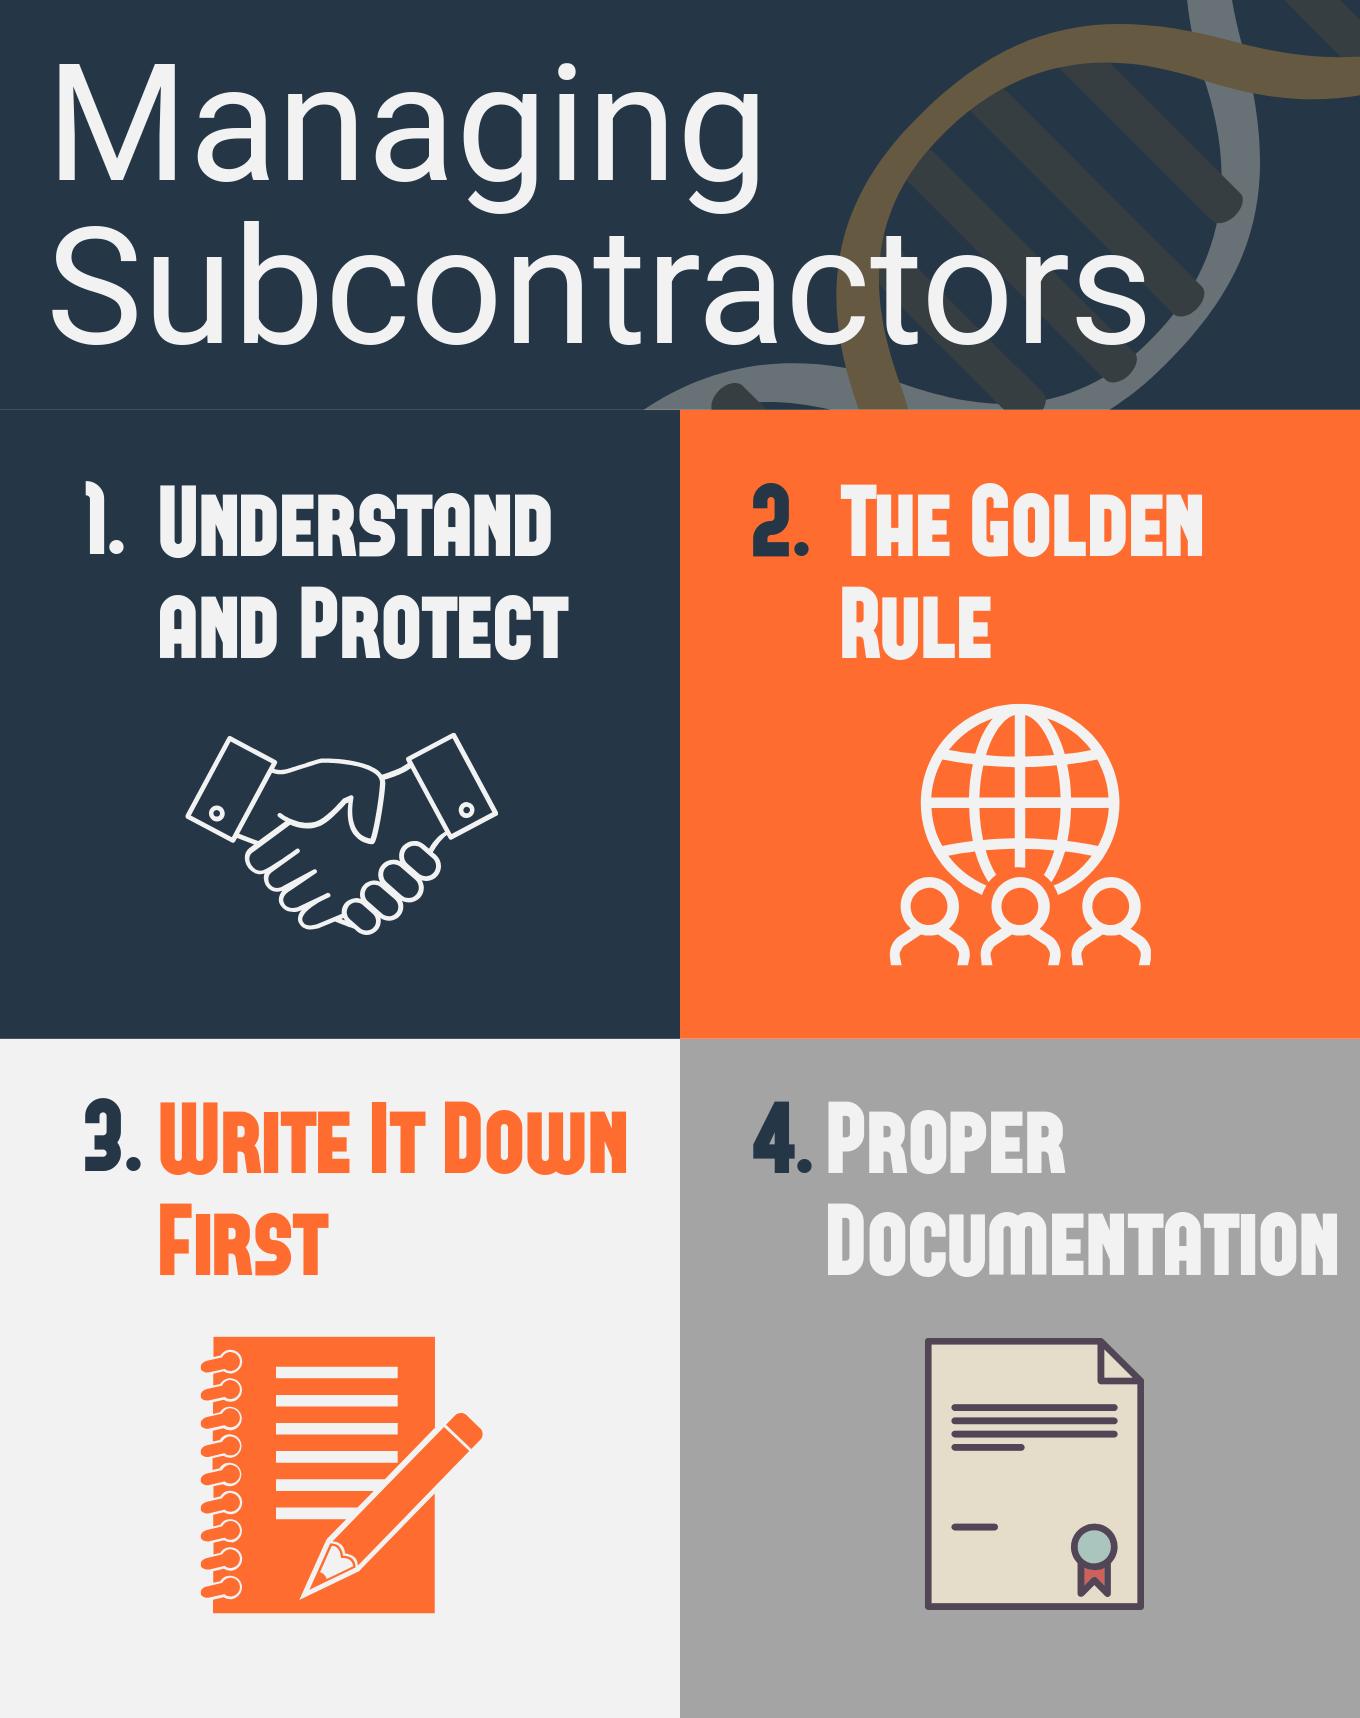 managing subcontractors infographic